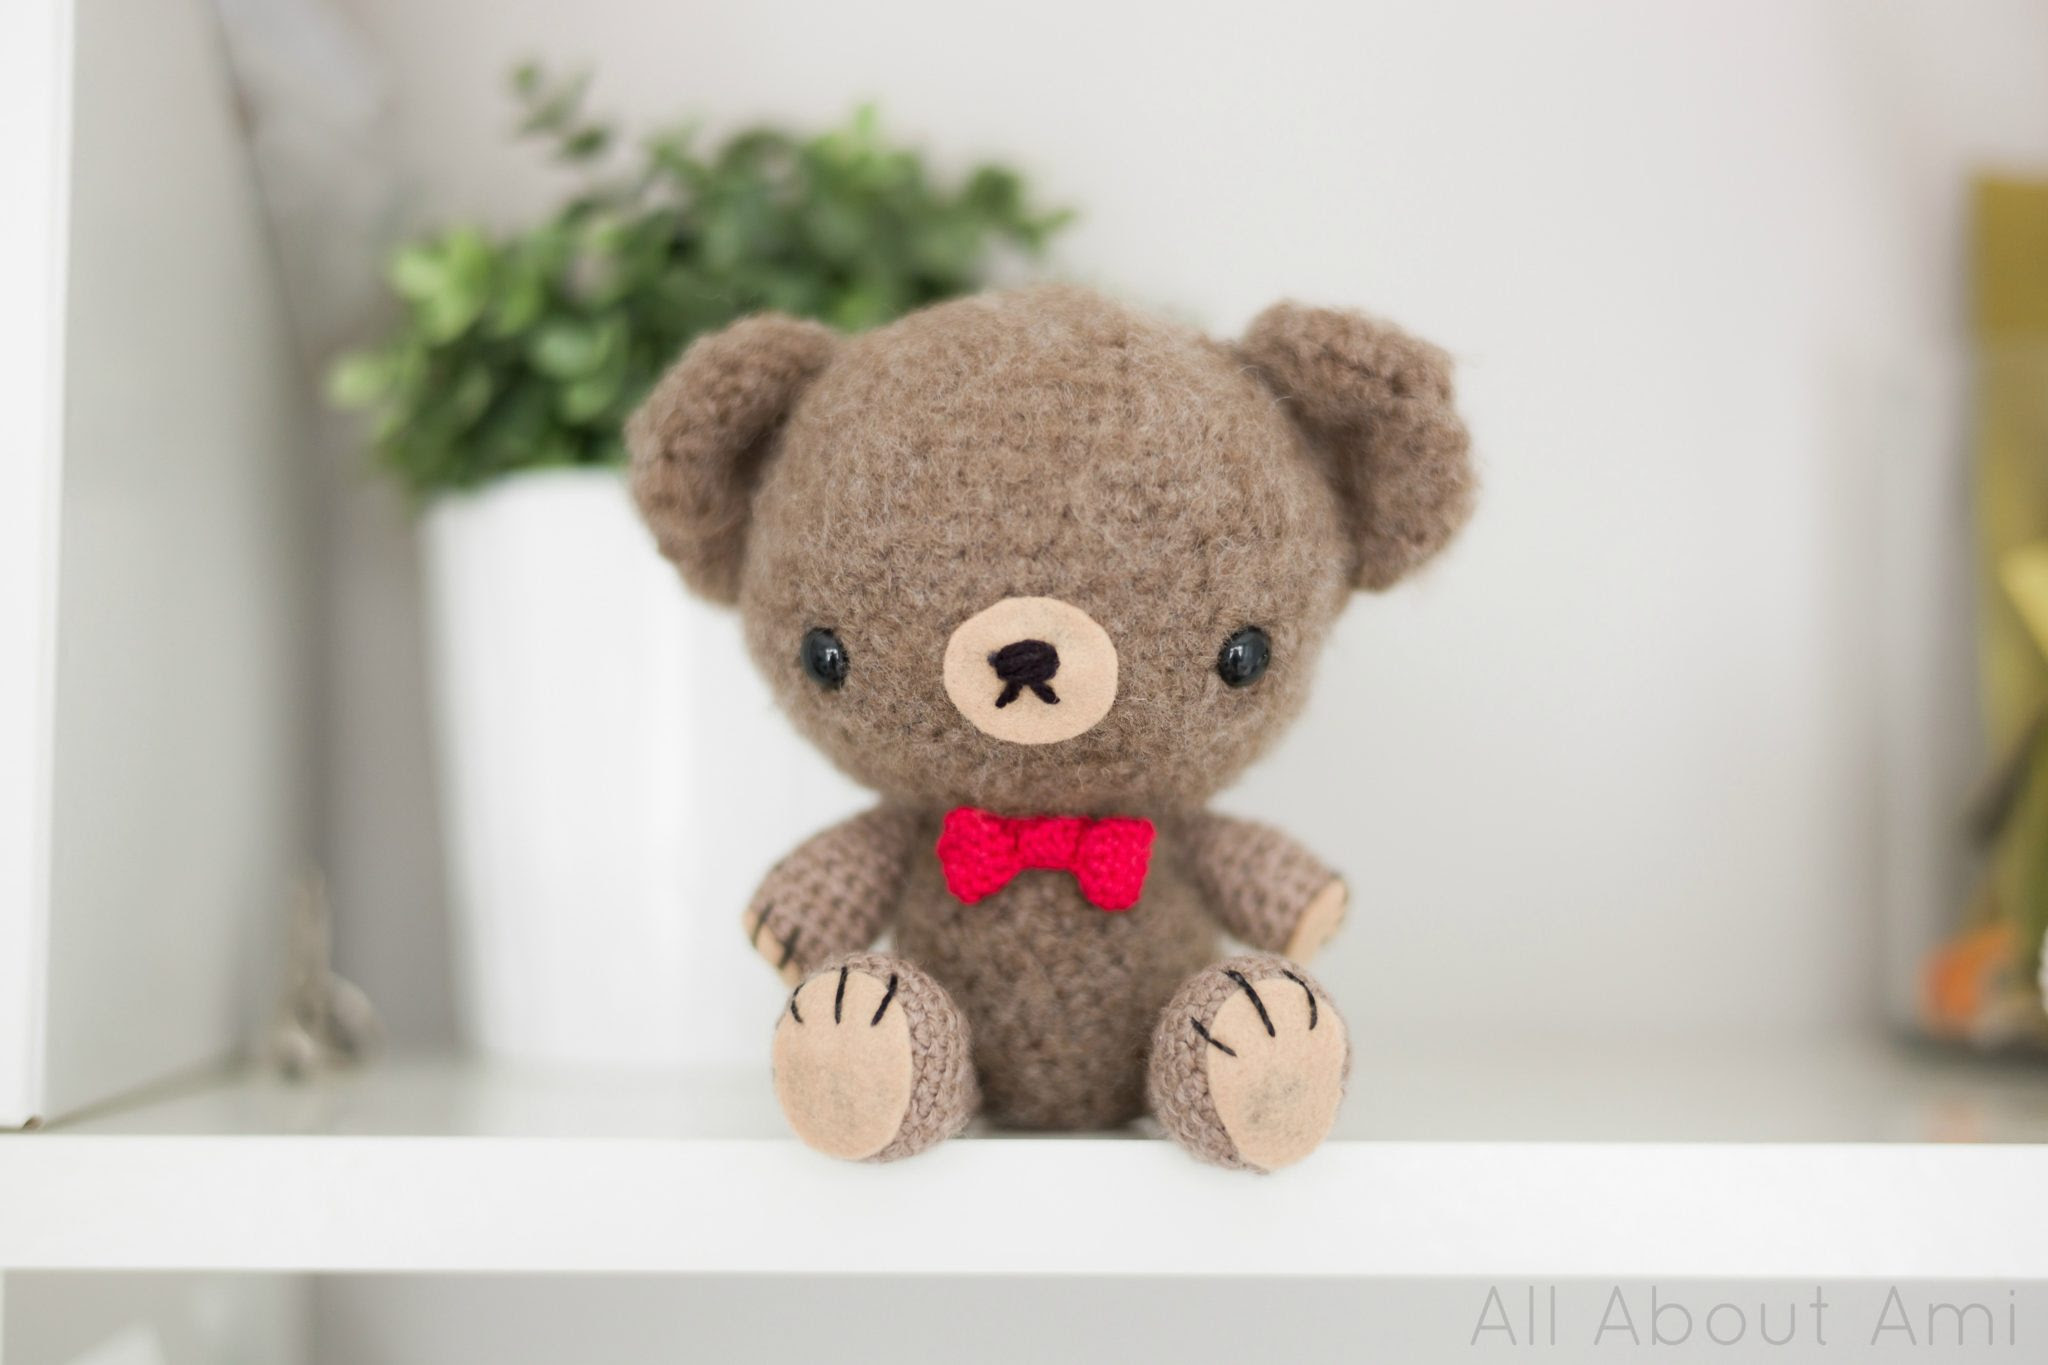 http://allaboutami.tumblr.com/post/3363172075/valentineteddypattern